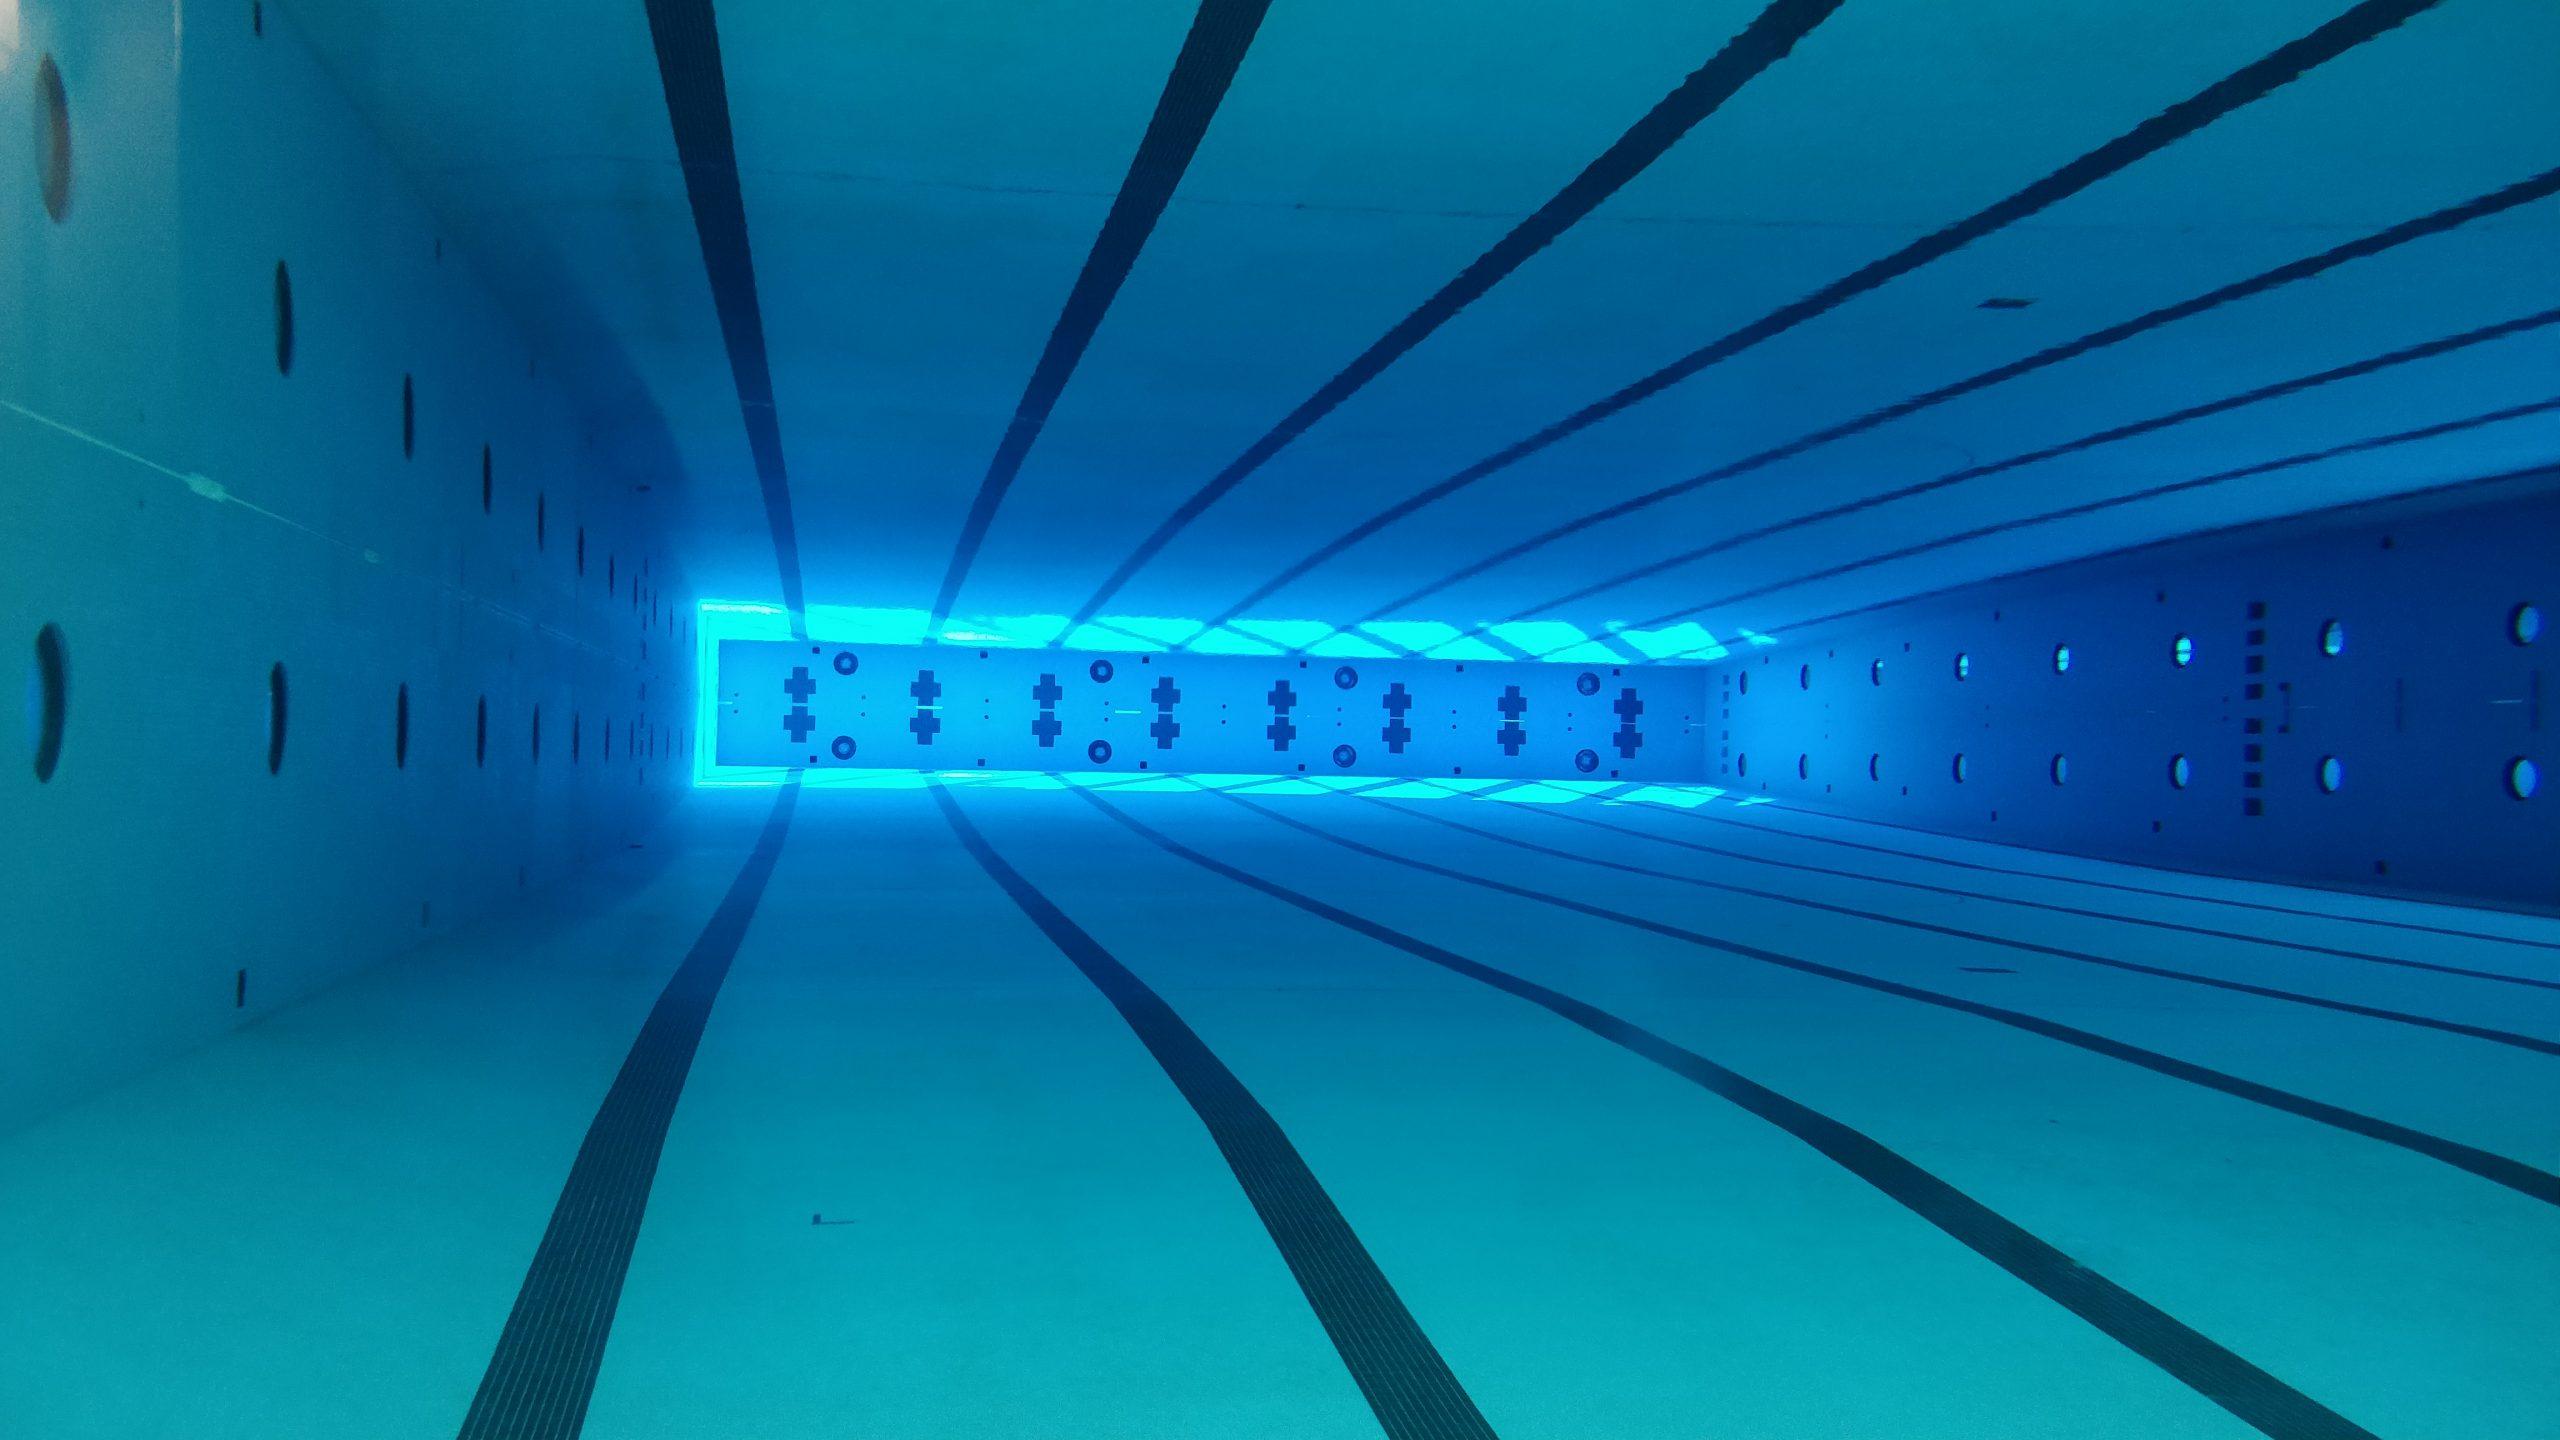 spsc-peter-hemingway-pool